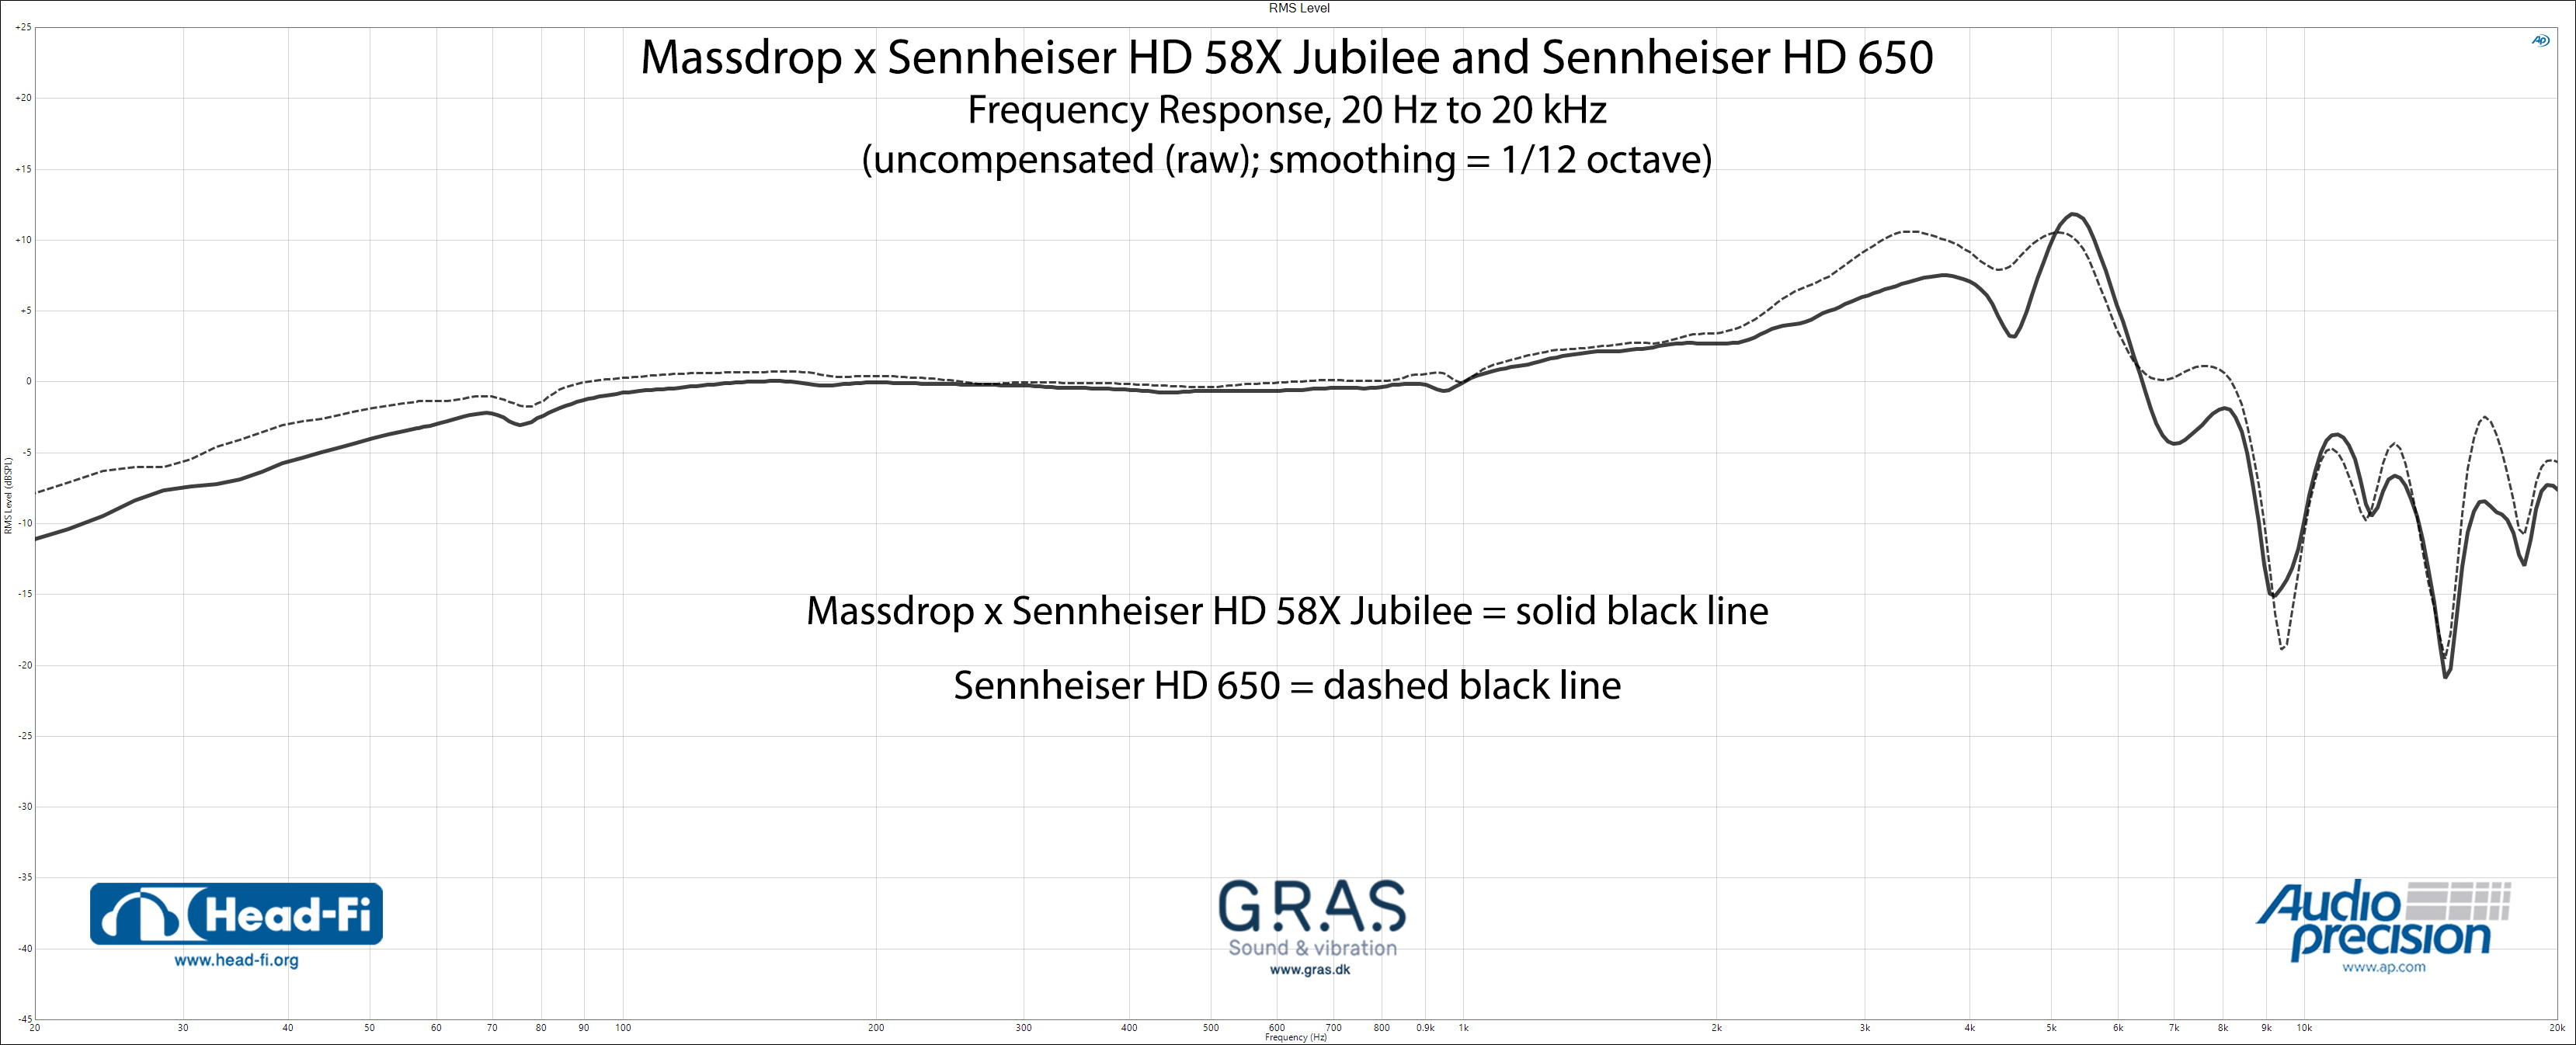 RMS-Level---Massdrop-x-Sennheiser-HD58X-Jubilee---Sennheiser-HD650.jpg